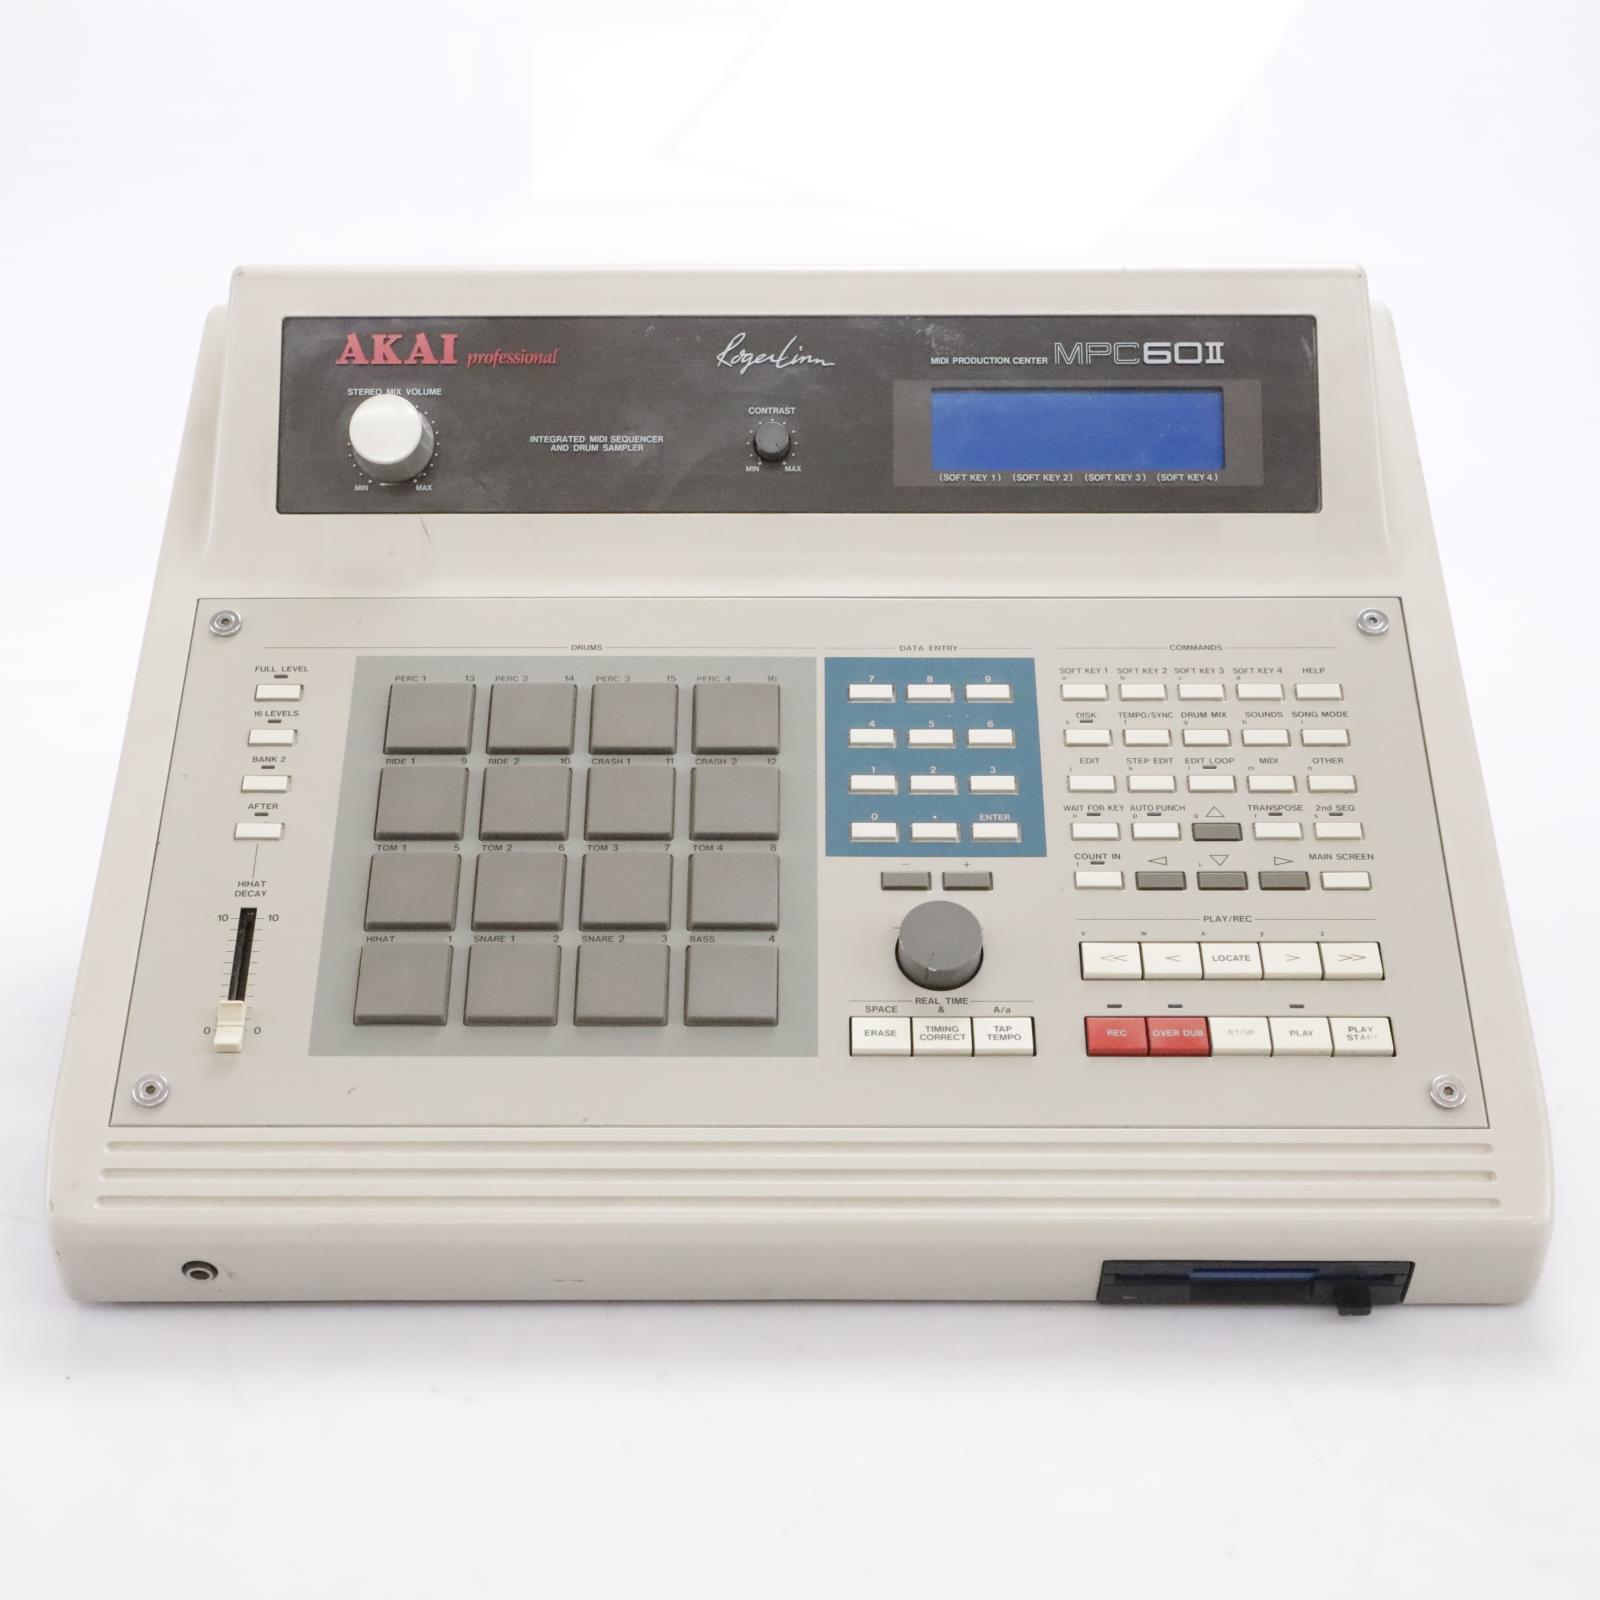 Akai MPC60II Production MIDI Center Drum Machine Sampler MPC60 II #44031